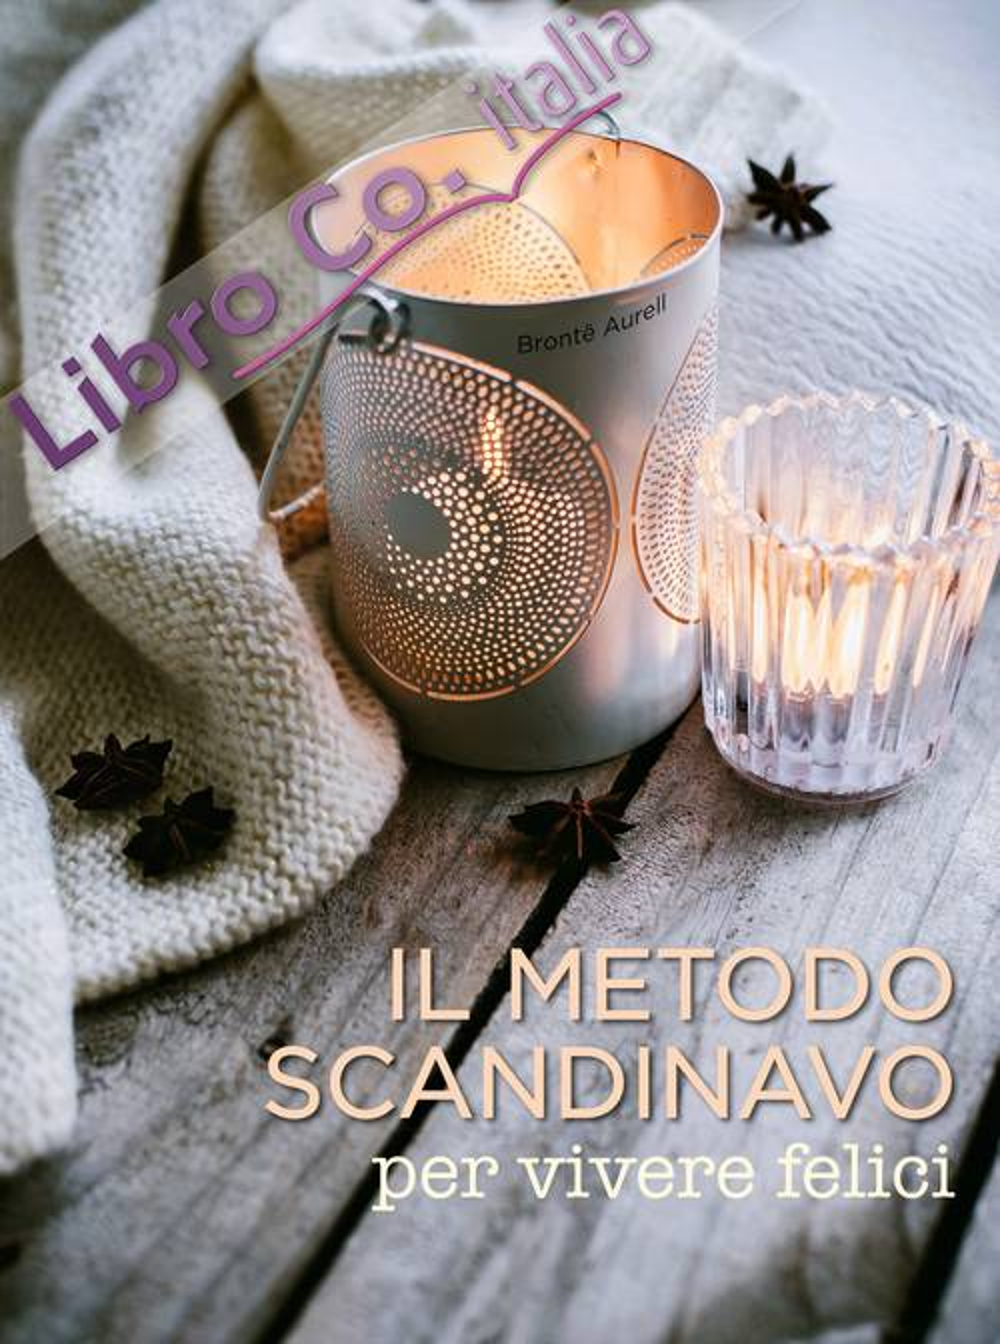 Il metodo scandinavo per vivere felici